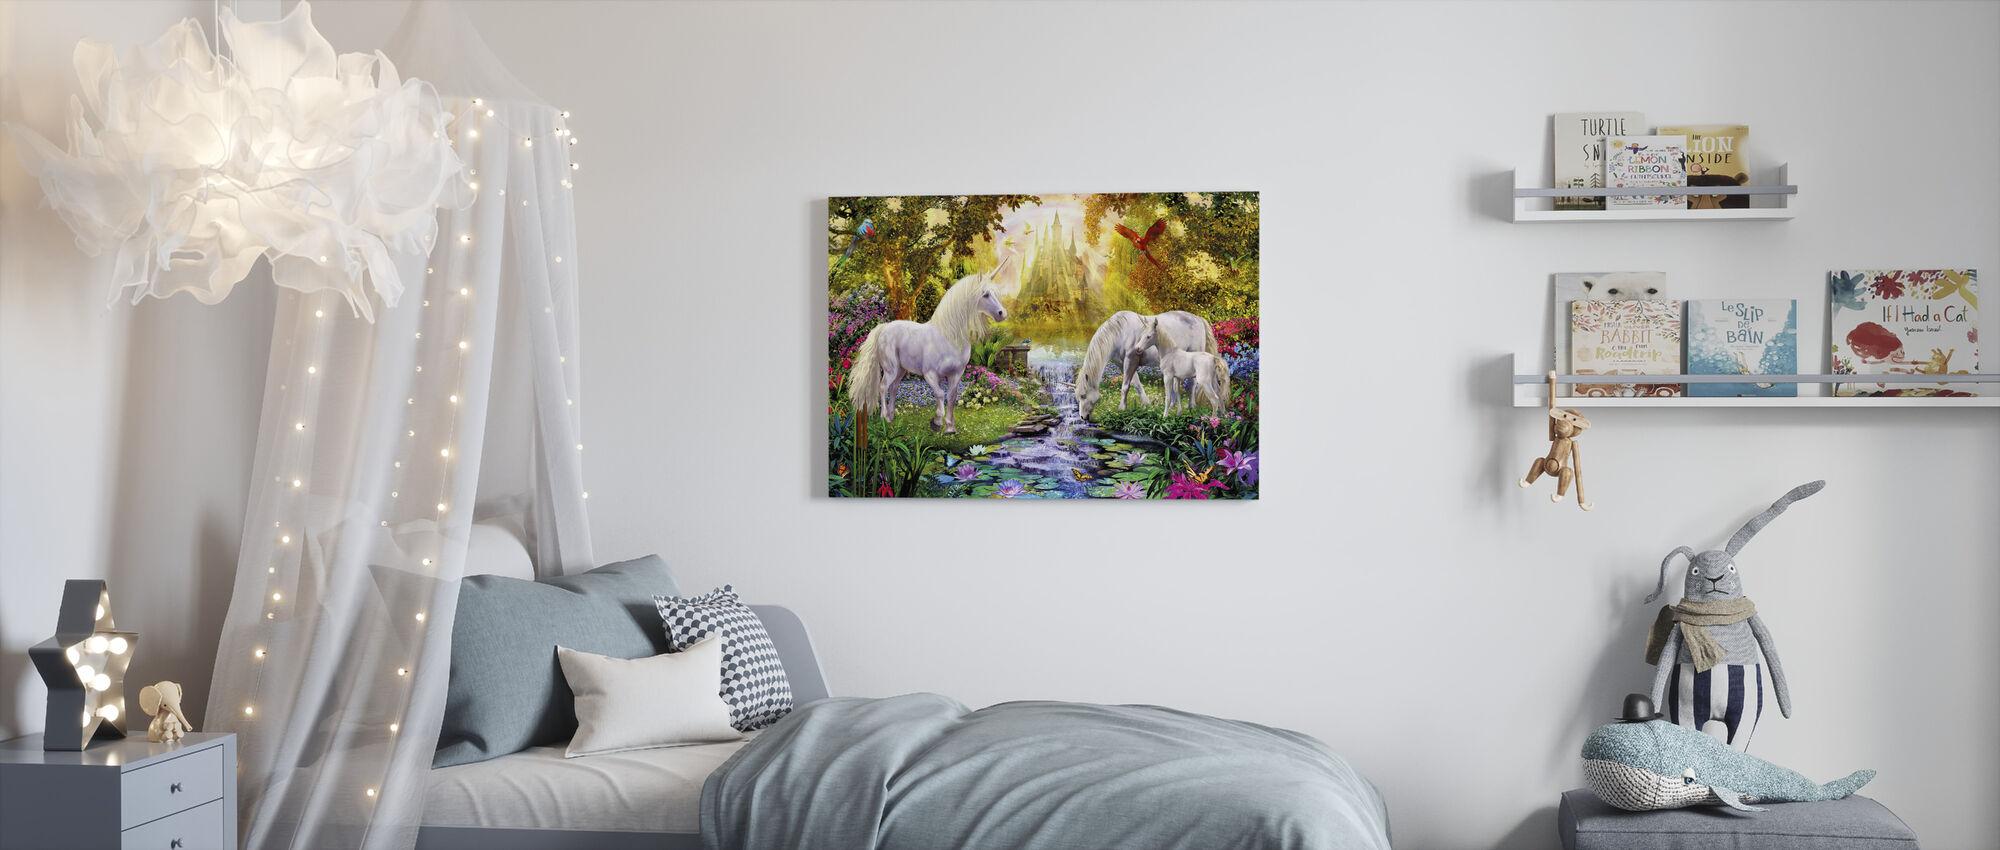 The Castle Unicorn Garden - Canvas print - Kids Room